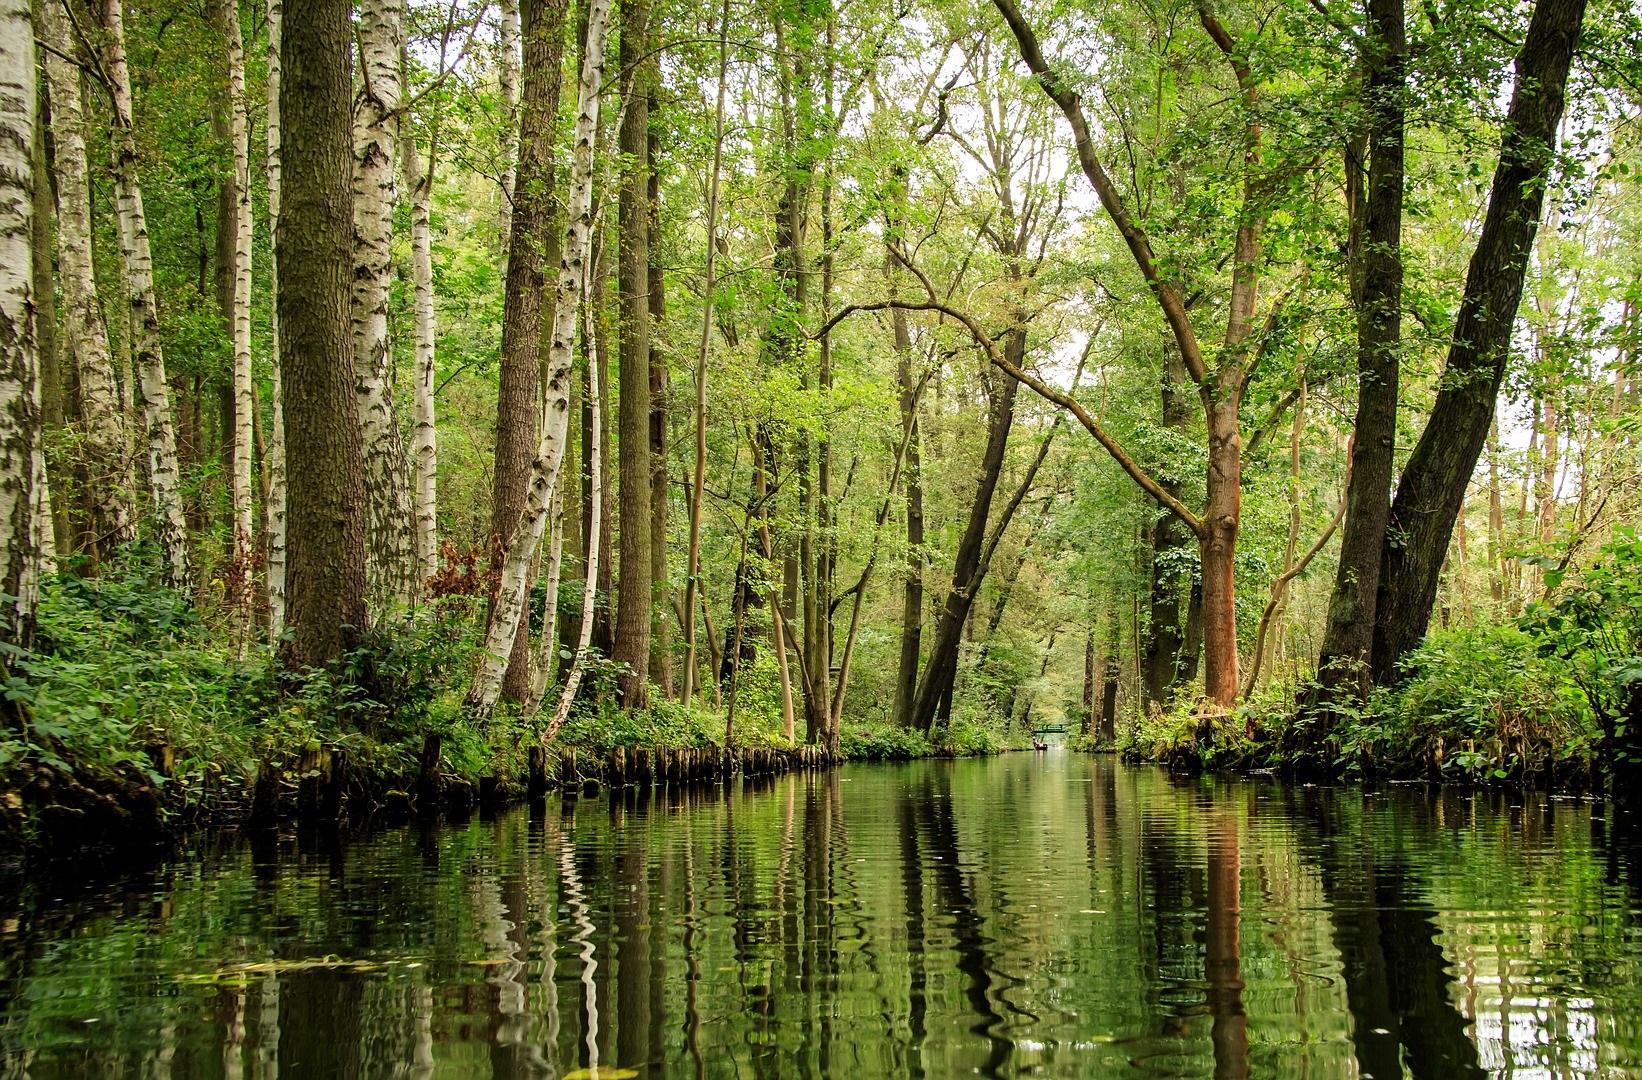 Fließ im Spreewald, Quelle: Pixabay